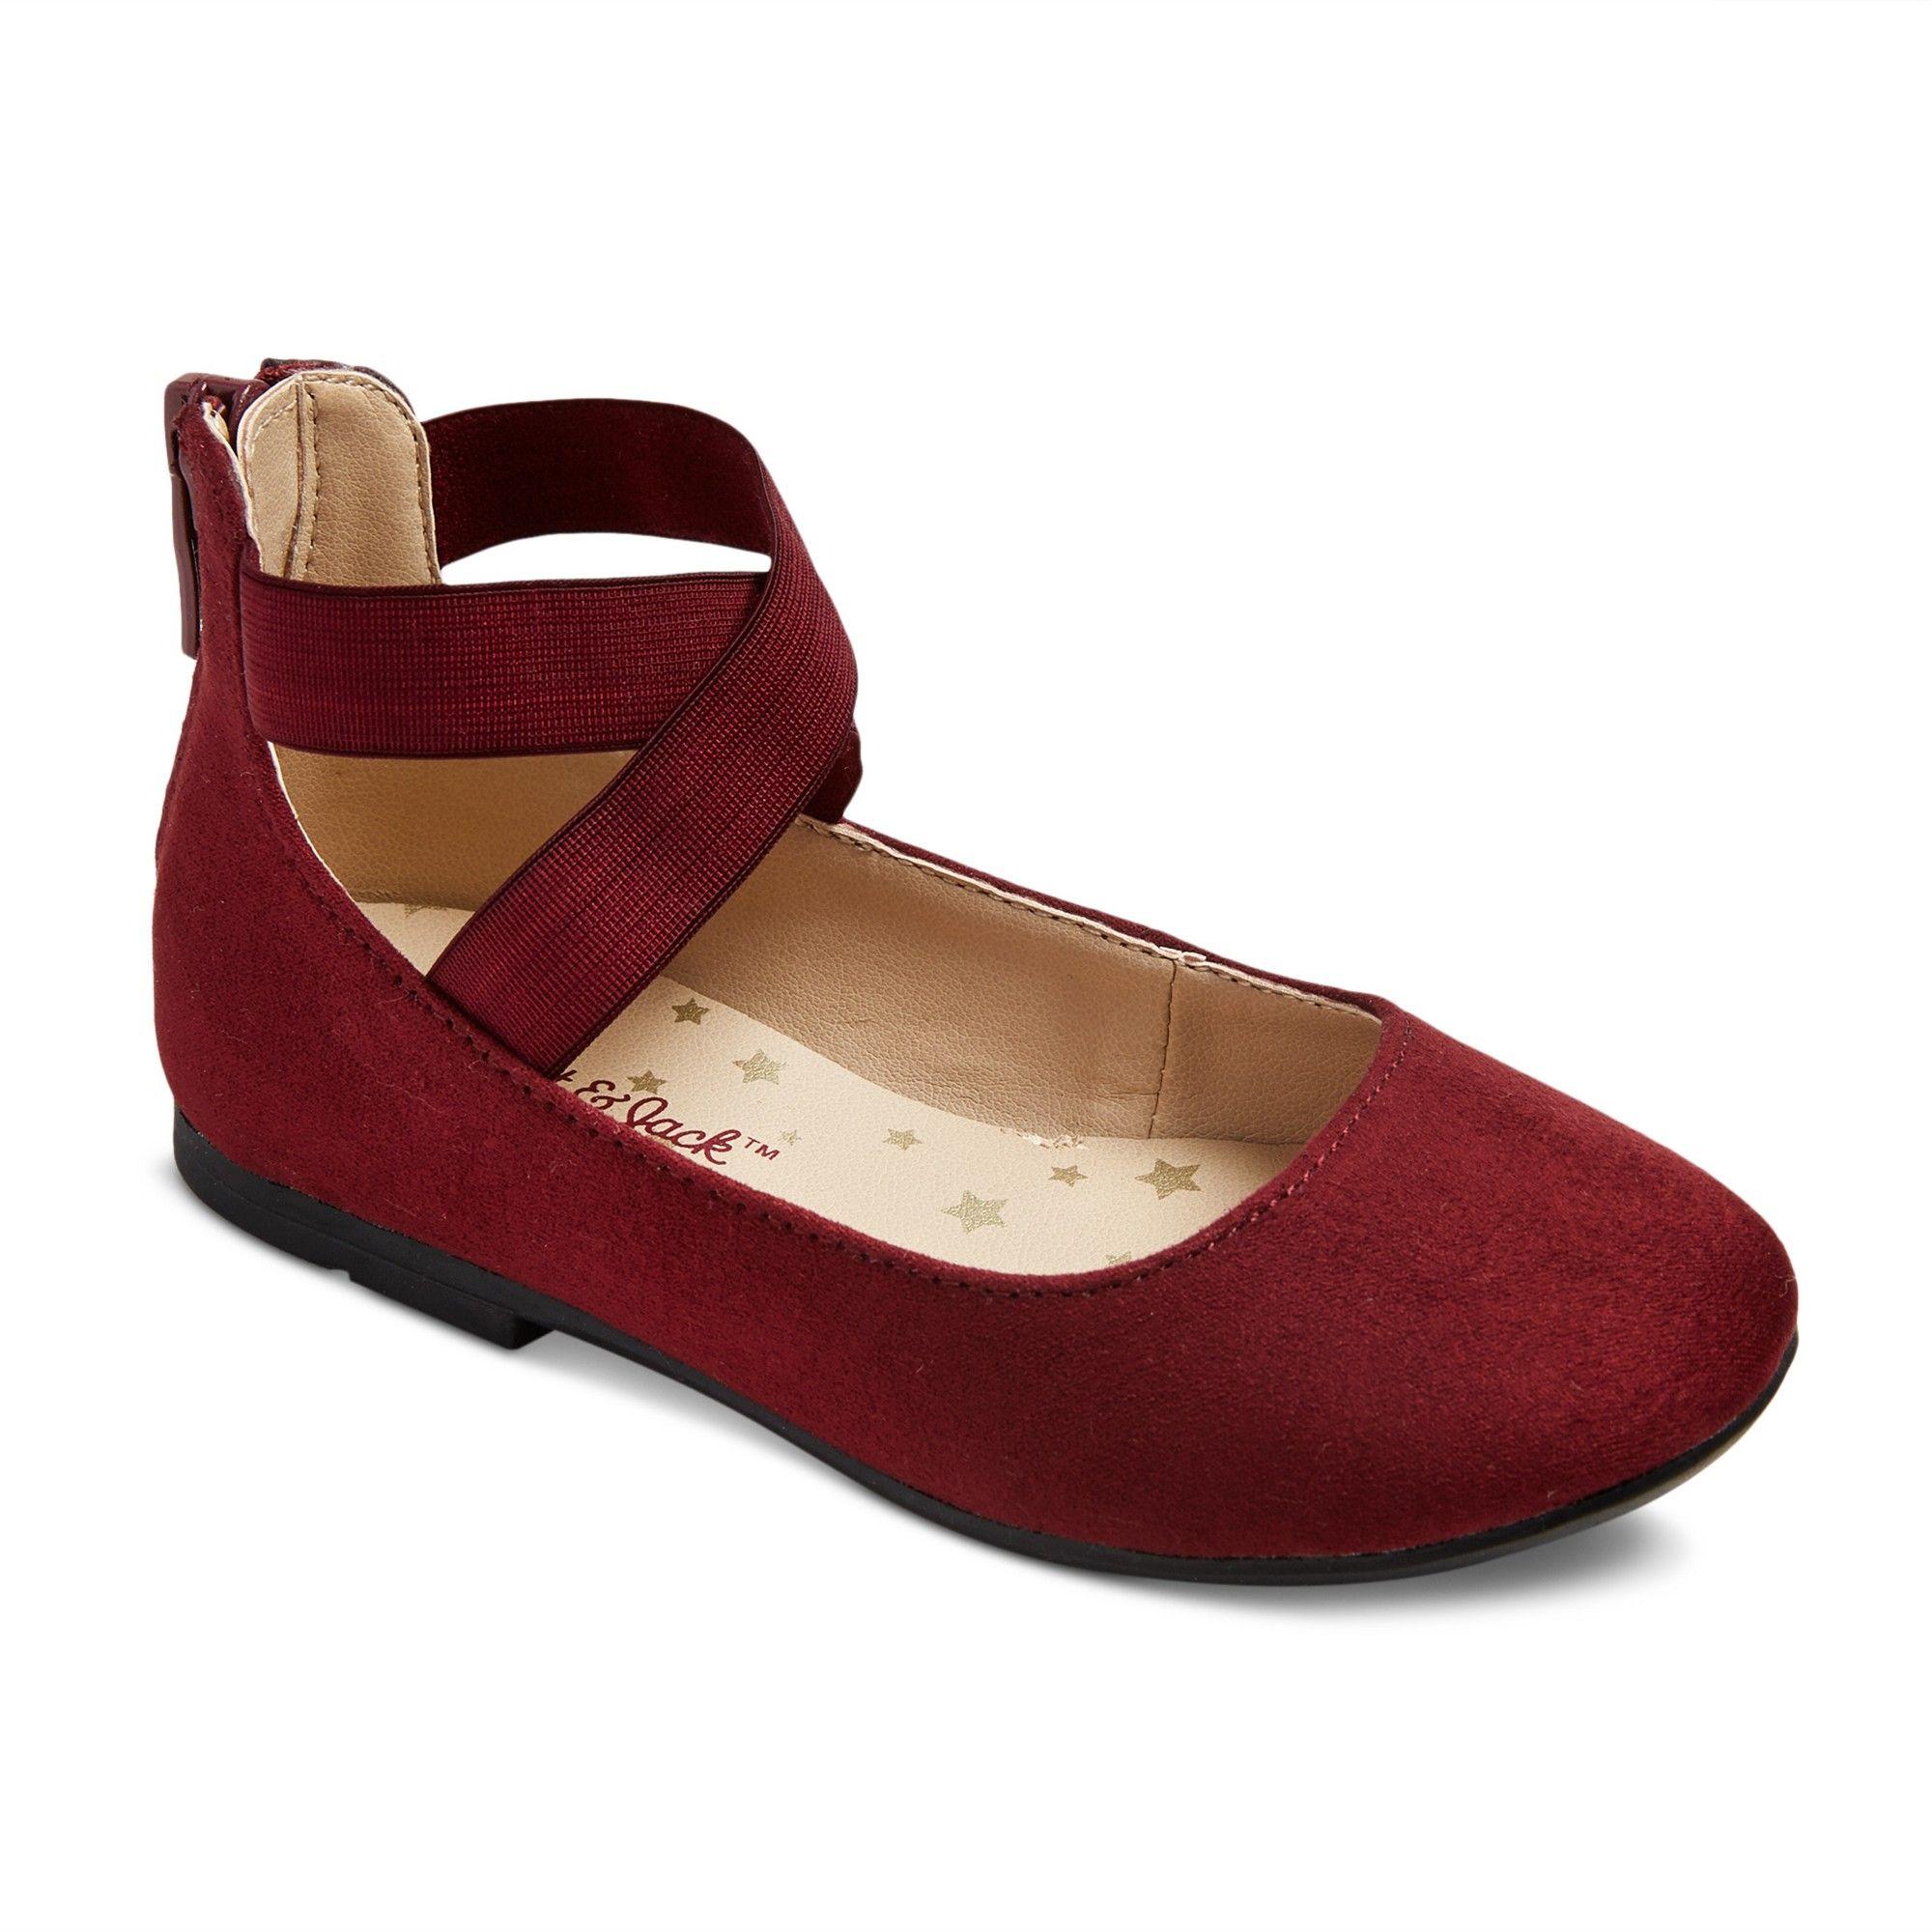 9a943d6dd31 Toddler Girls' Candace Ballet Flats 10 - Cat & Jack - Burgundy (Red ...